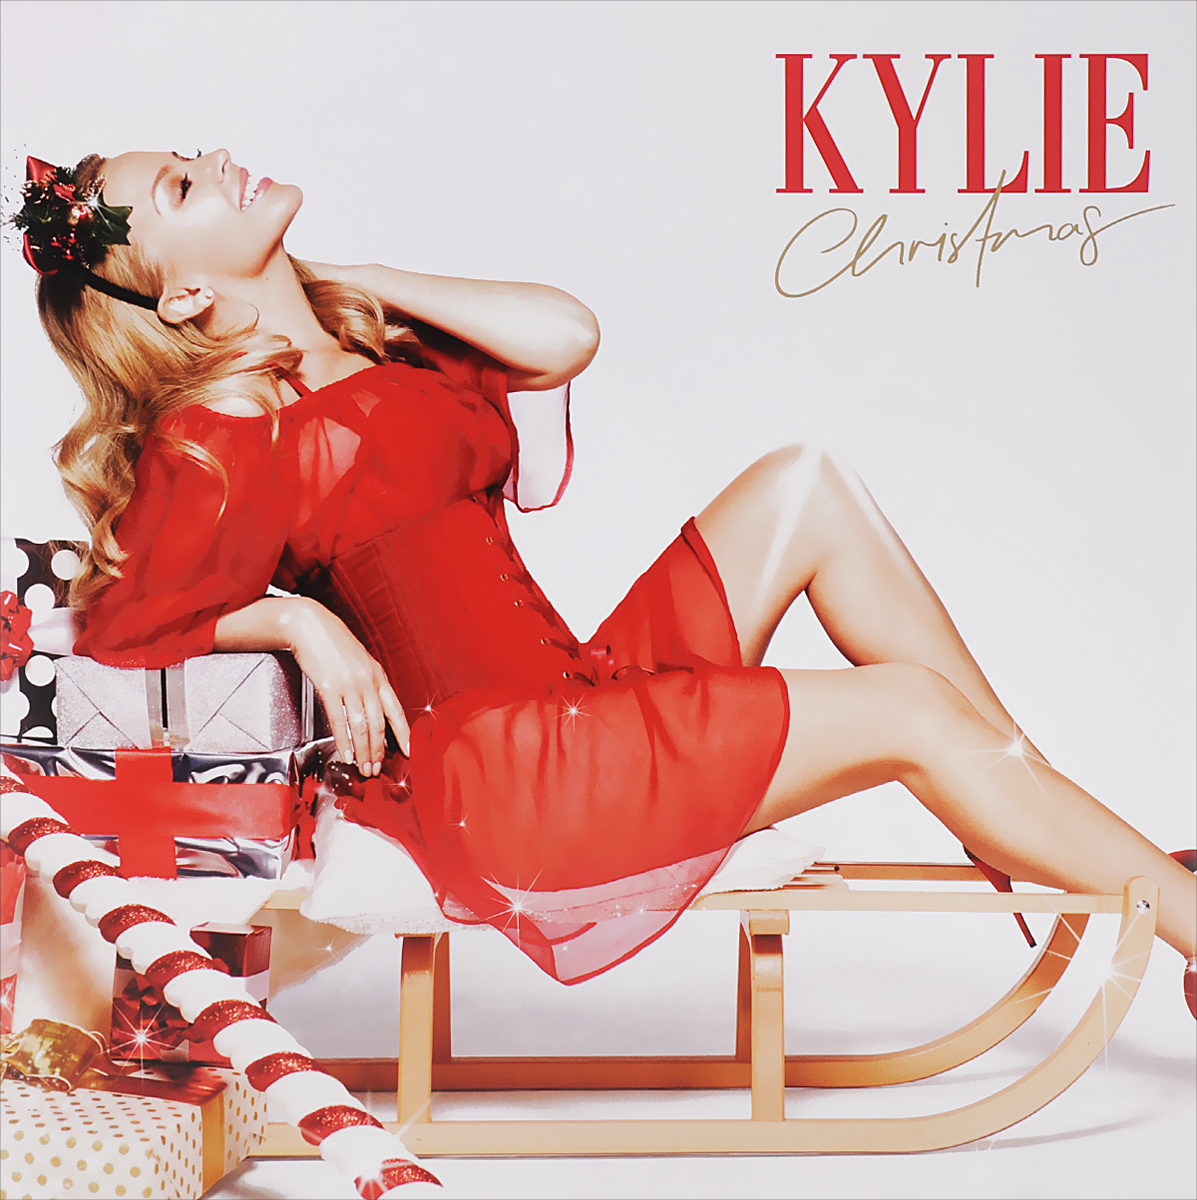 Kylie Kylie. Christmas (LP) color therapy лак для ногтей тон 190 sally hansen